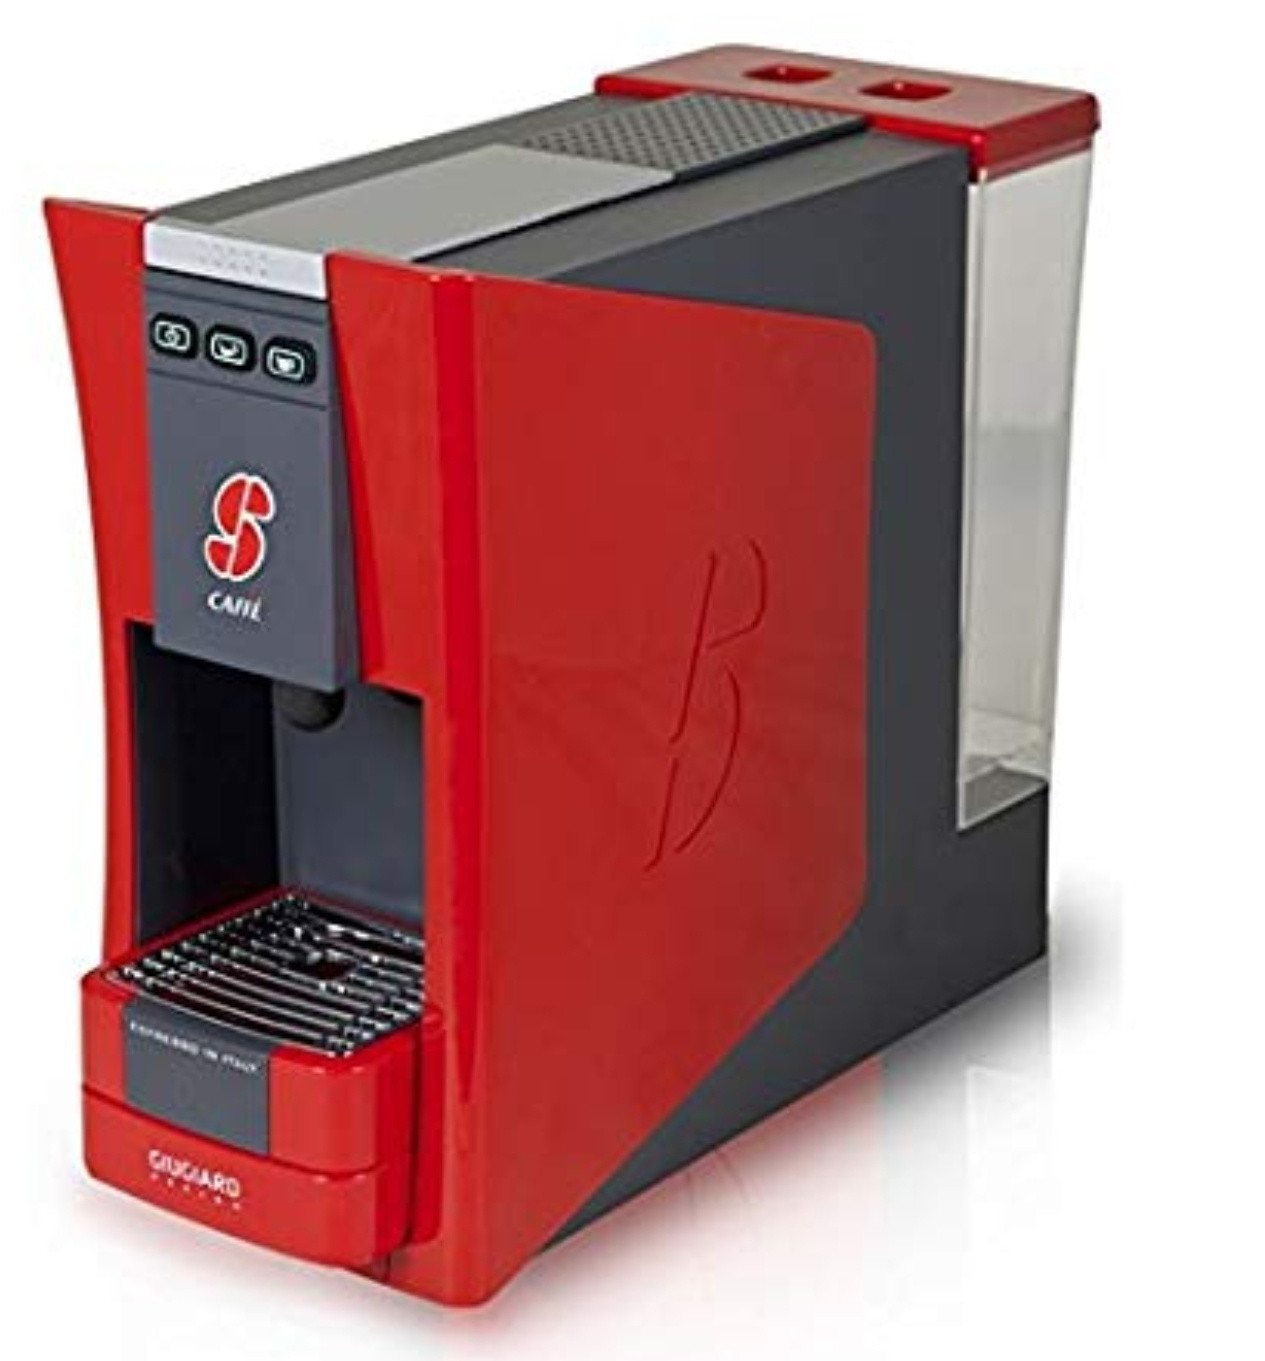 MACCHINA ESSSE CAFFE' S 12 + 100 CAPSULE OMAGGIO